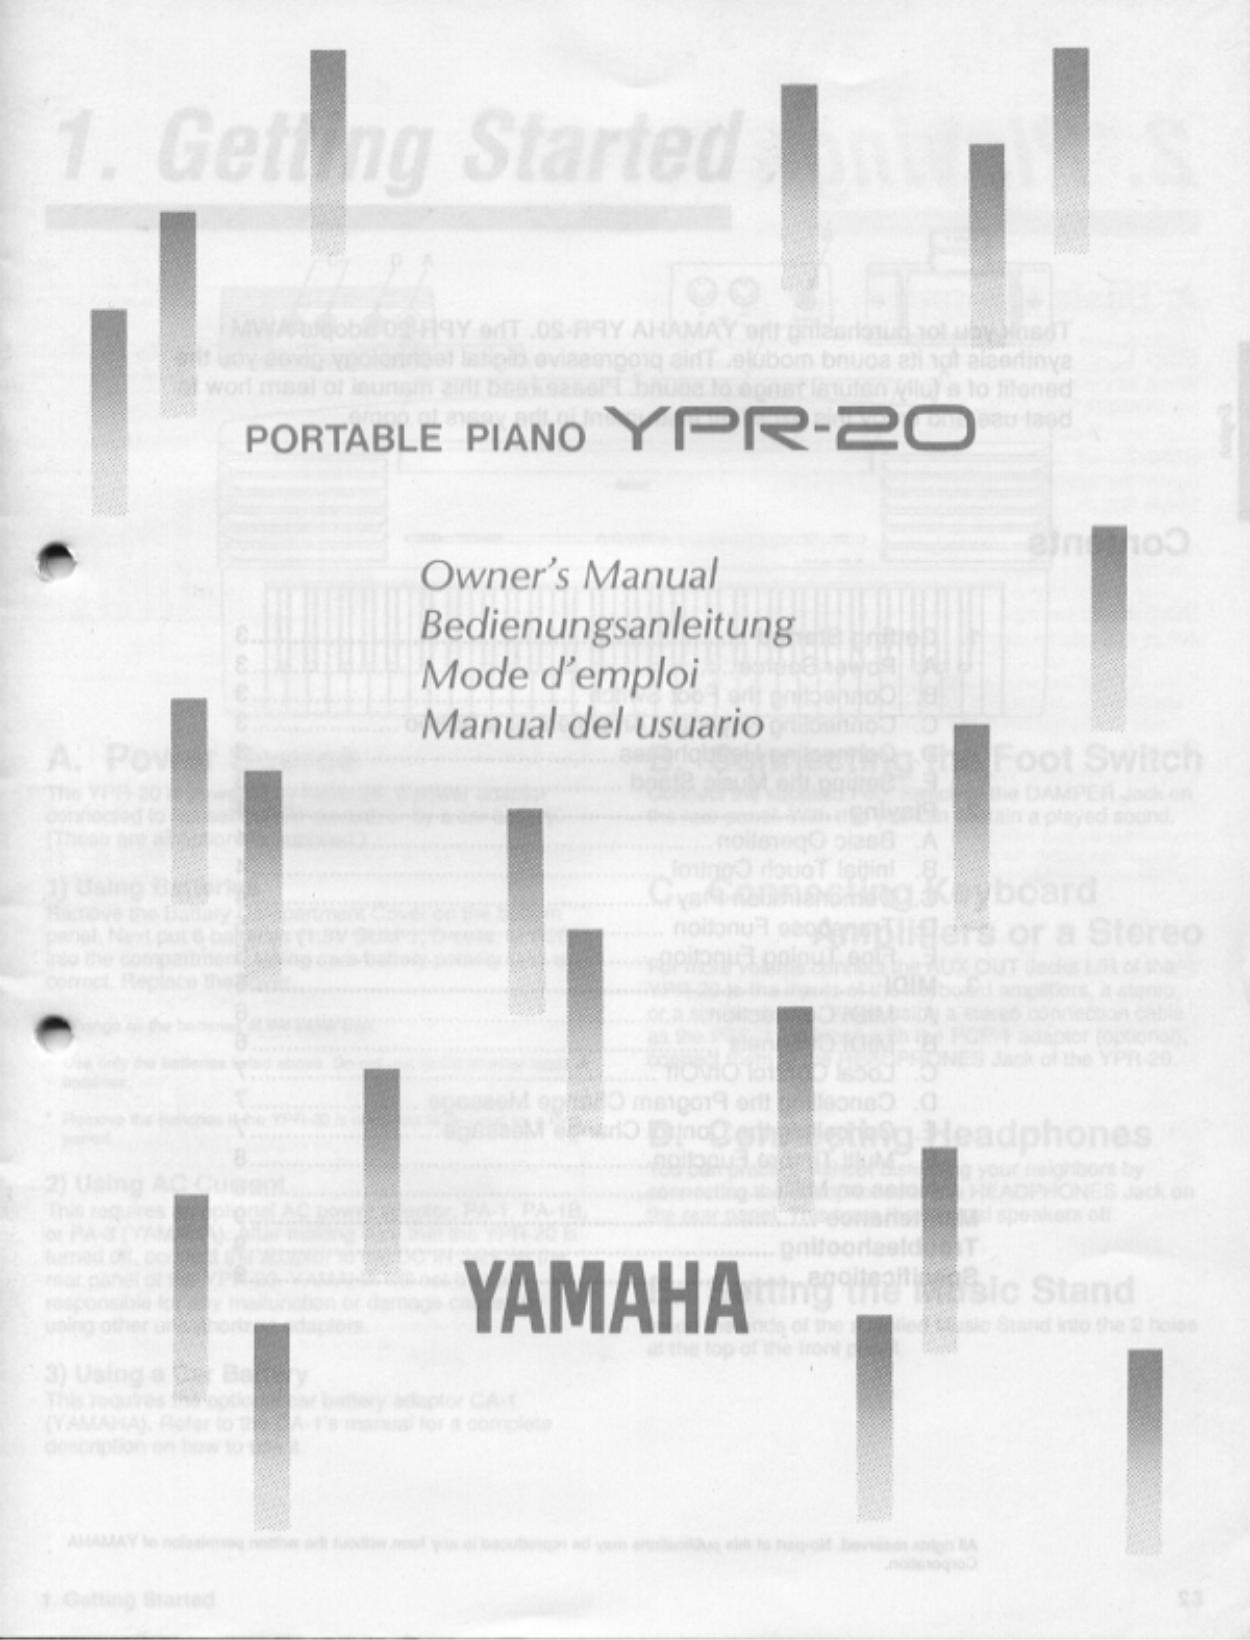 pdf for Yamaha Music Keyboard YPR-50 manual